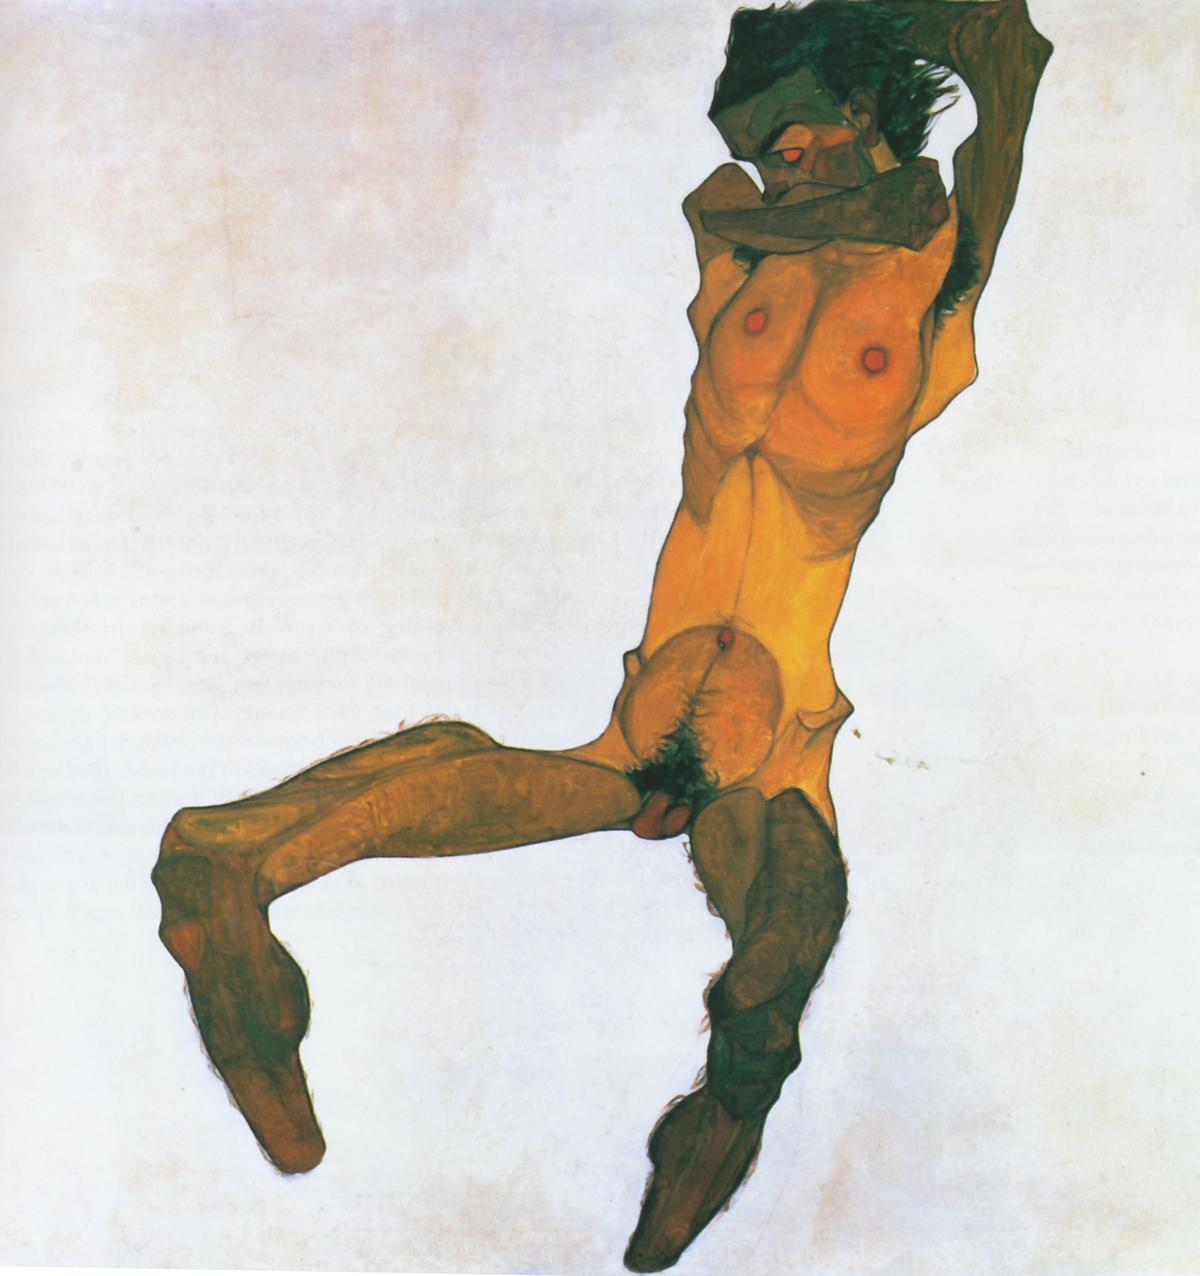 'Desnudo masculino sentado (Autorretrato)' - 1910